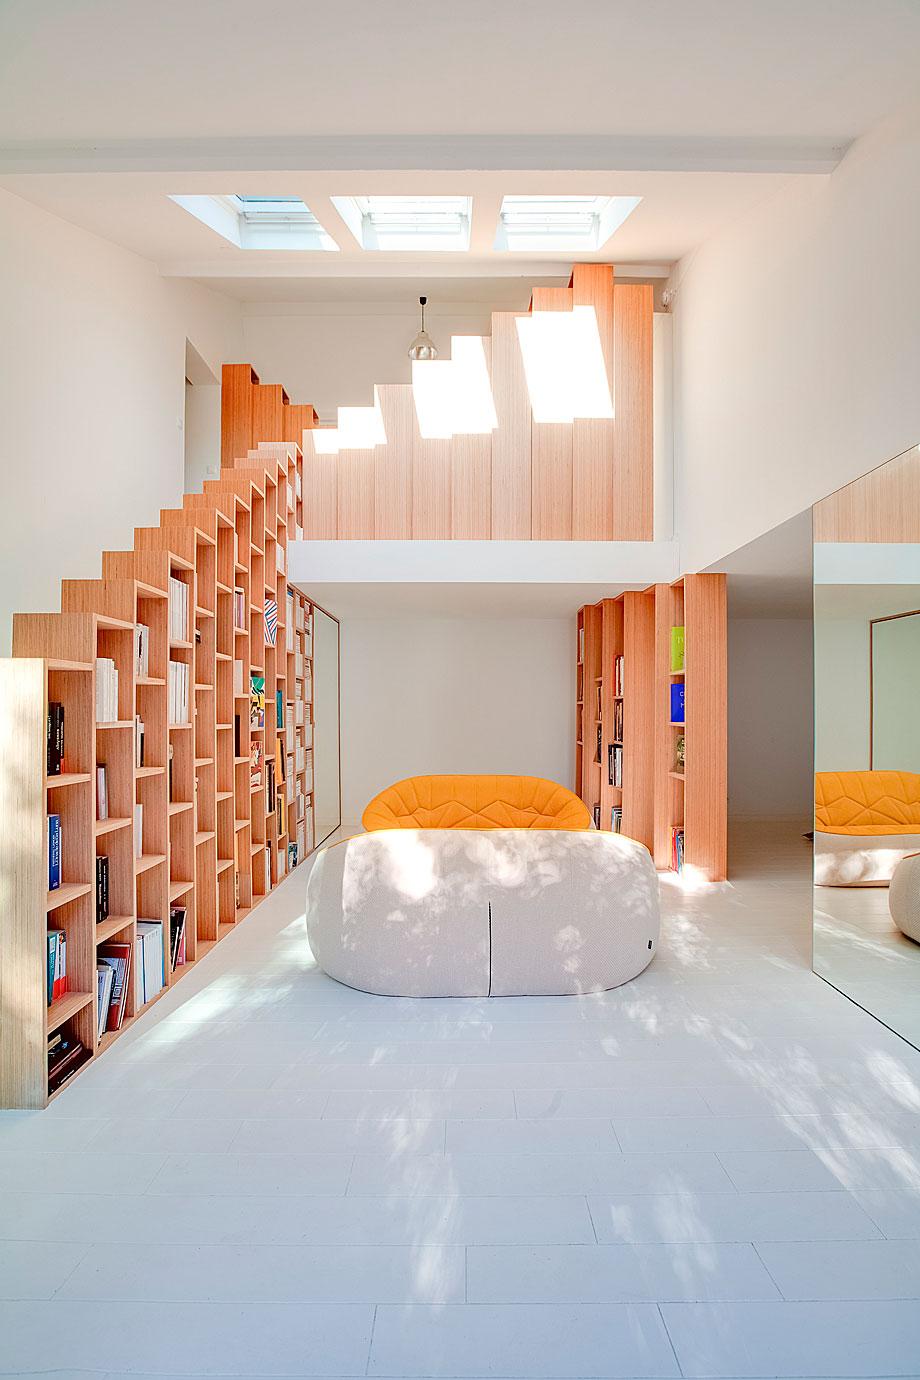 bookshelf-house-andrea-mosca-1